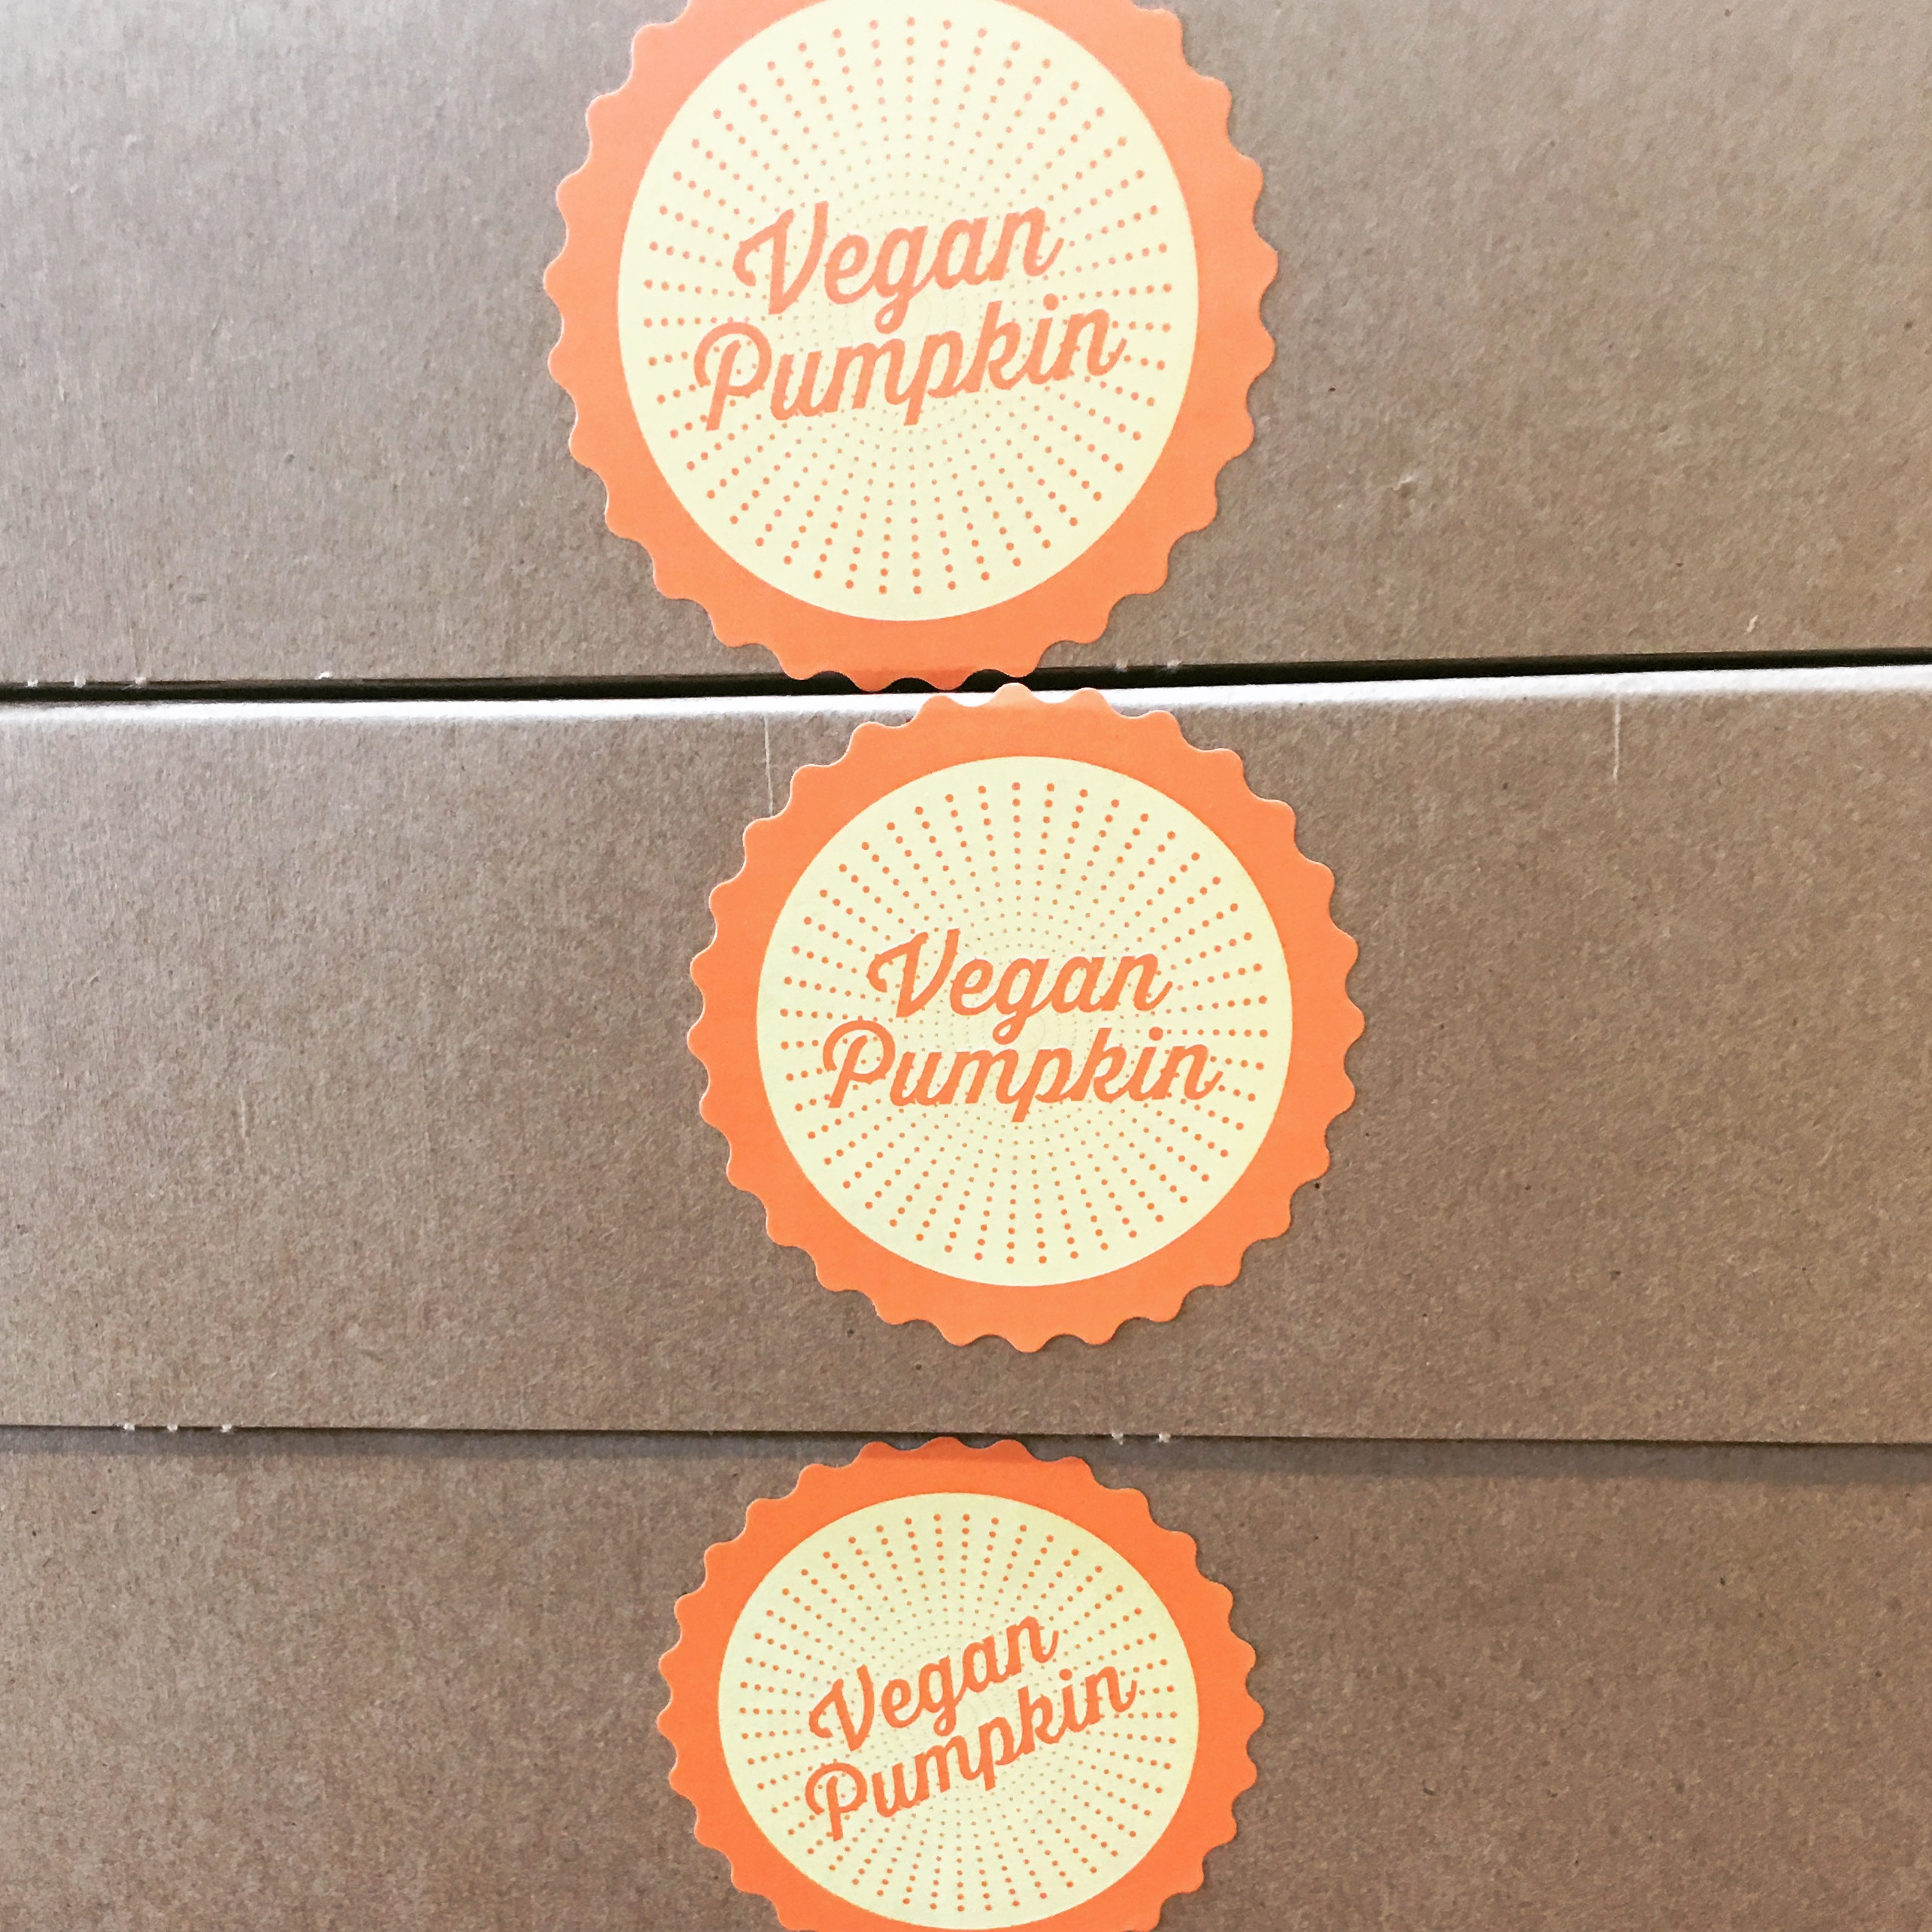 3 Thanksgiving food - vegan pumpkin pie at Whole Foods